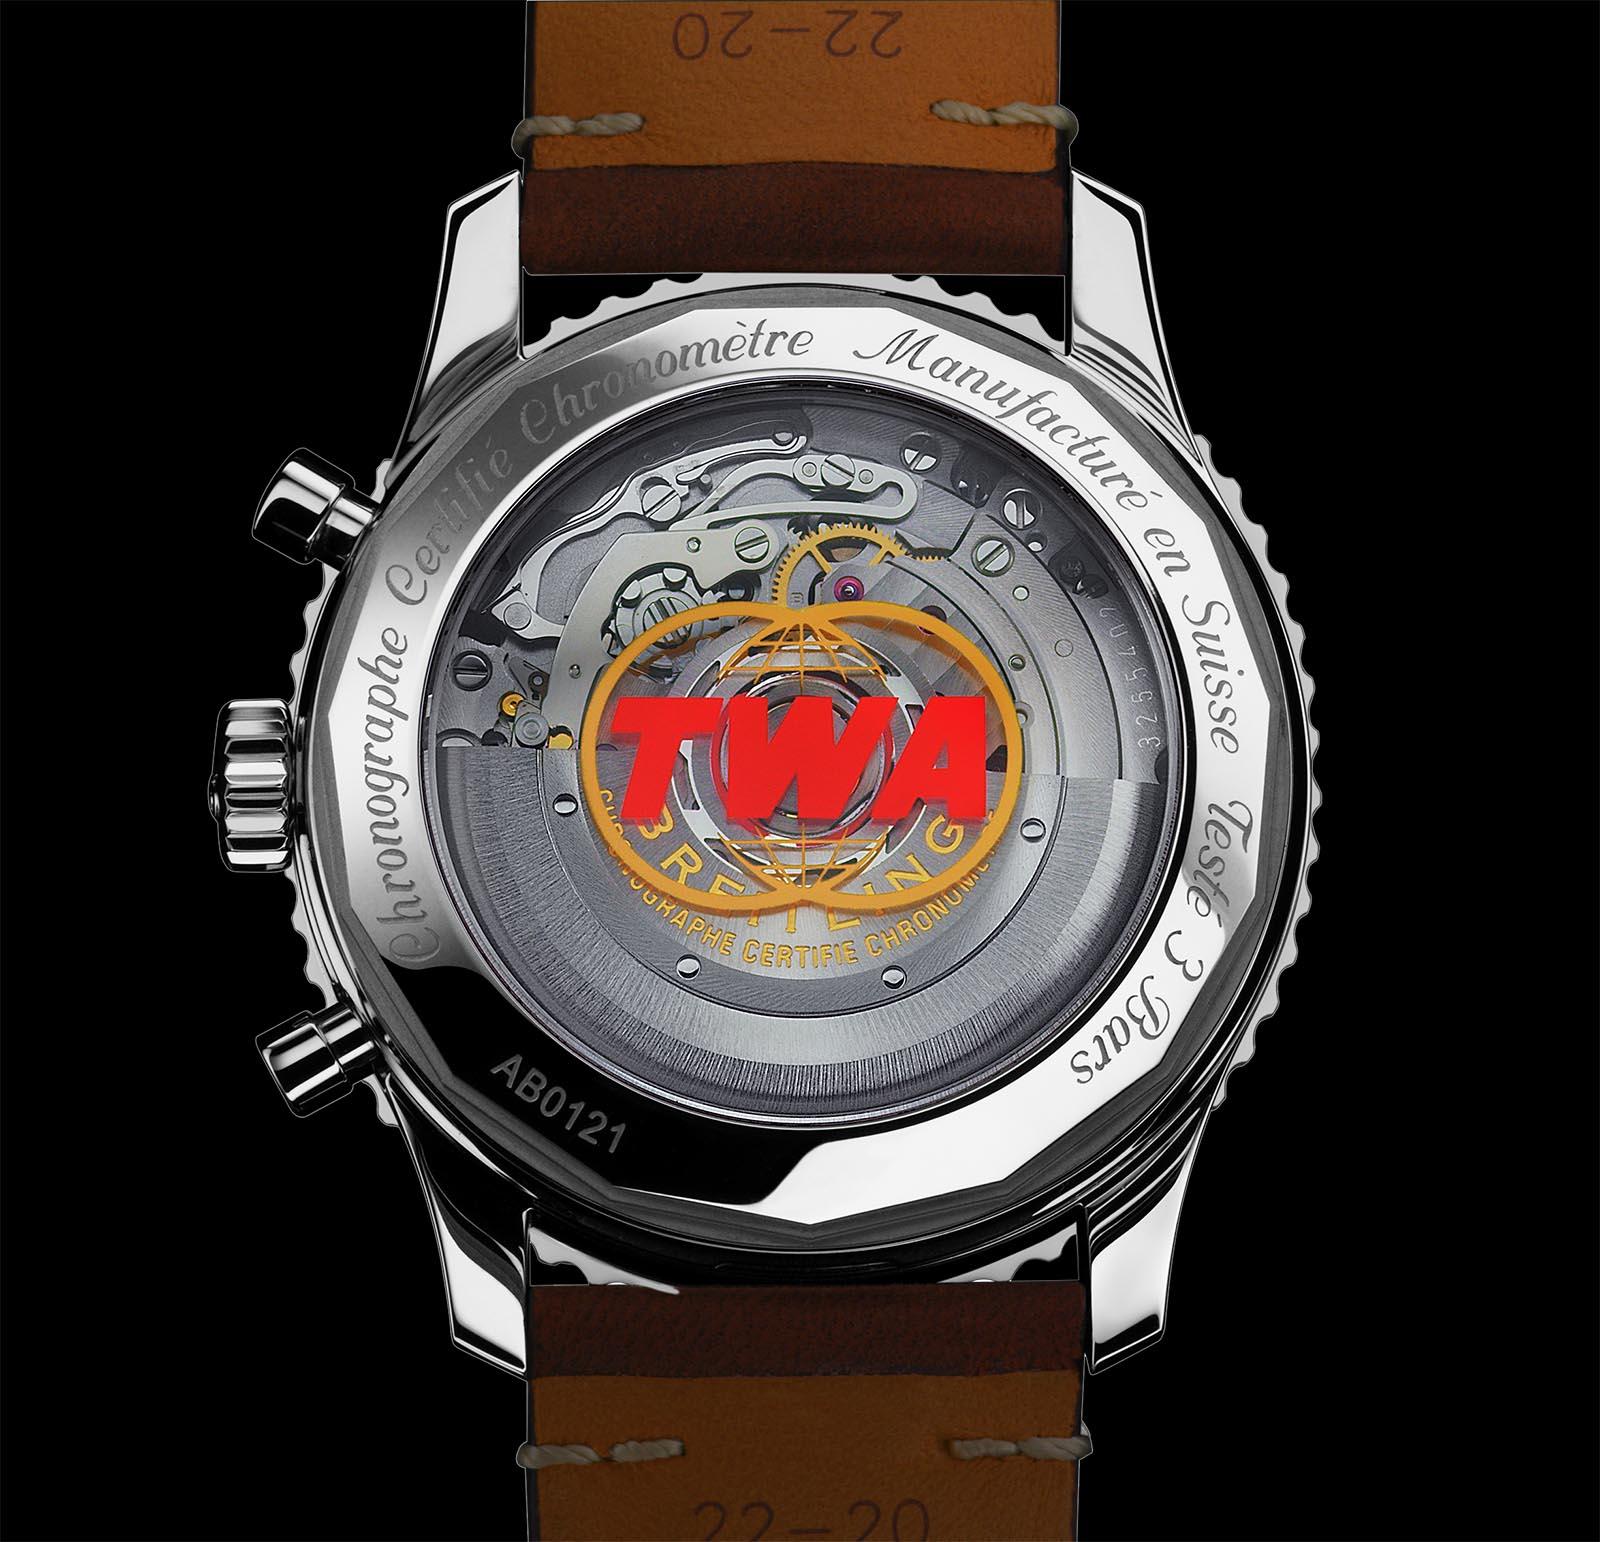 Breitling Navitimer 1 B01 Chronograph 43 TWA Edition 2